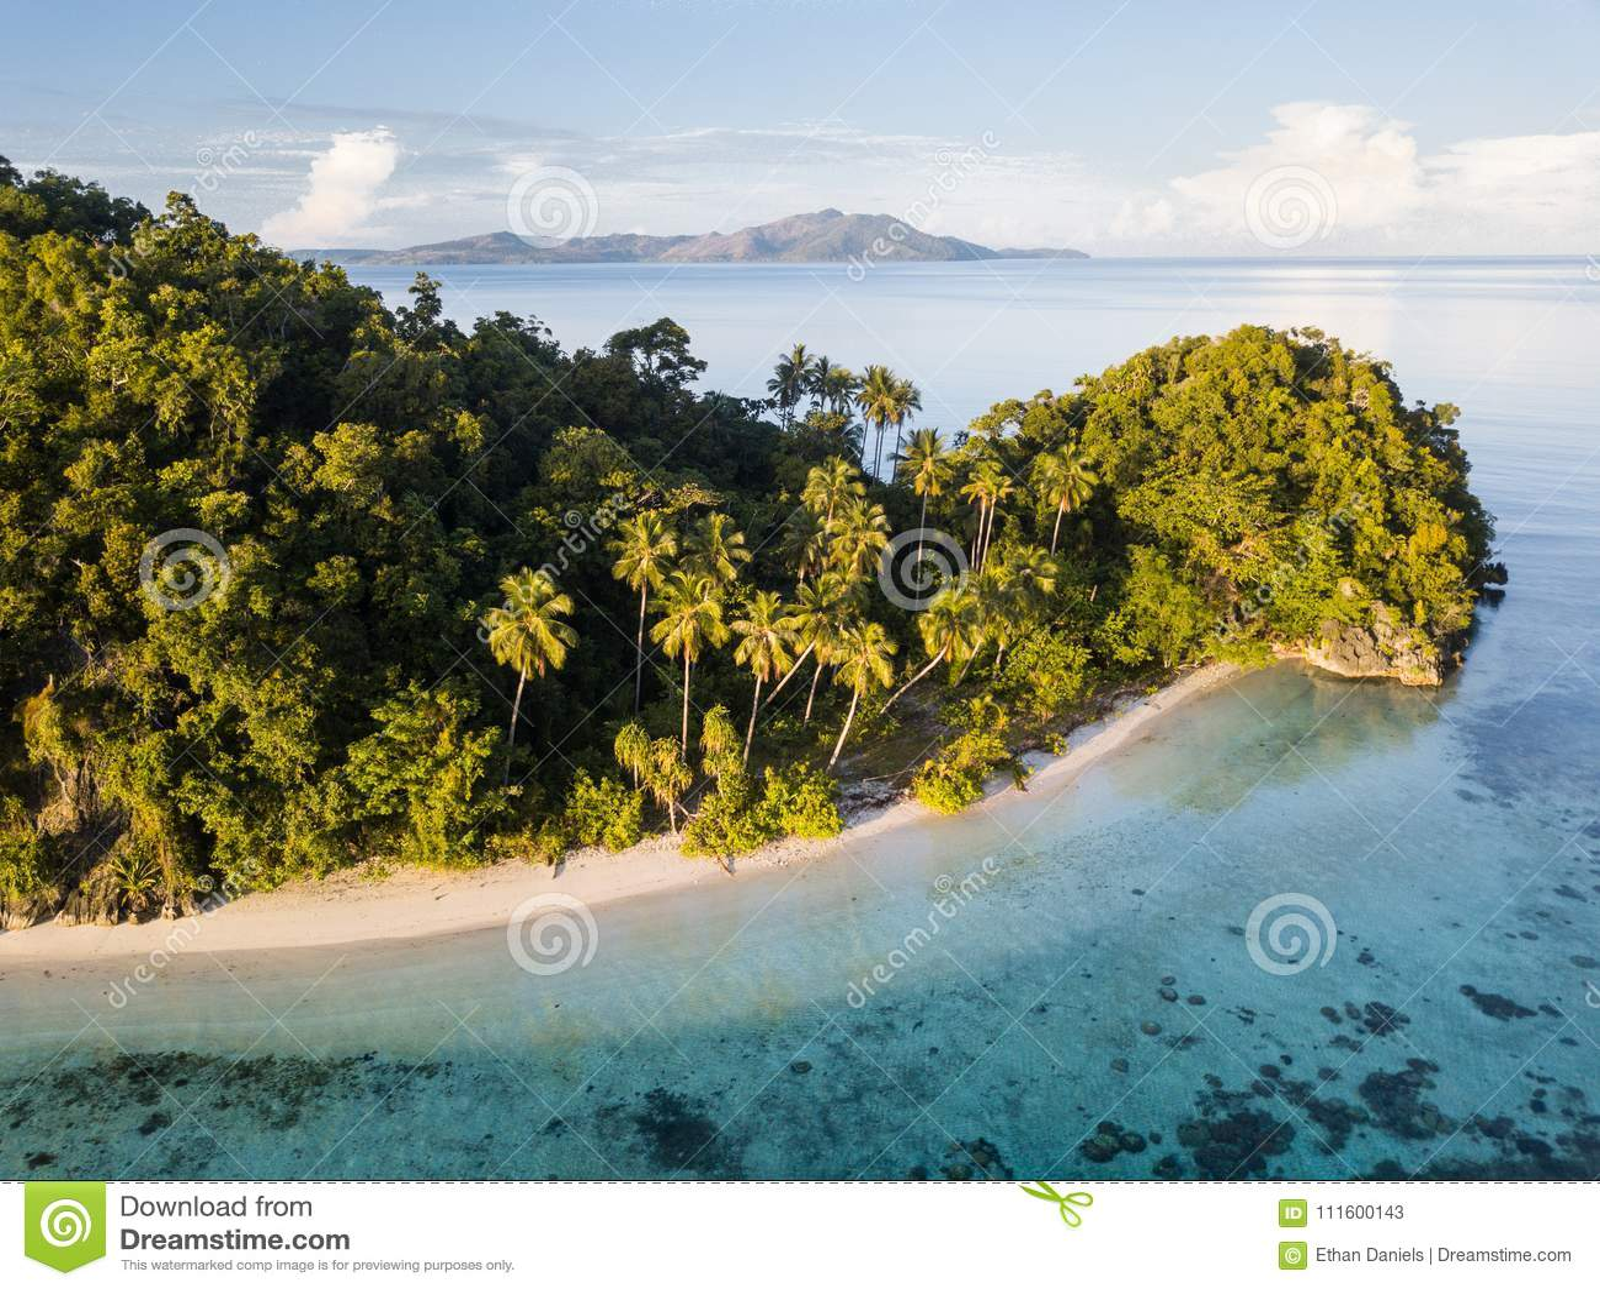 Aerial View of Idyllic Island and Beach in Raja Ampat